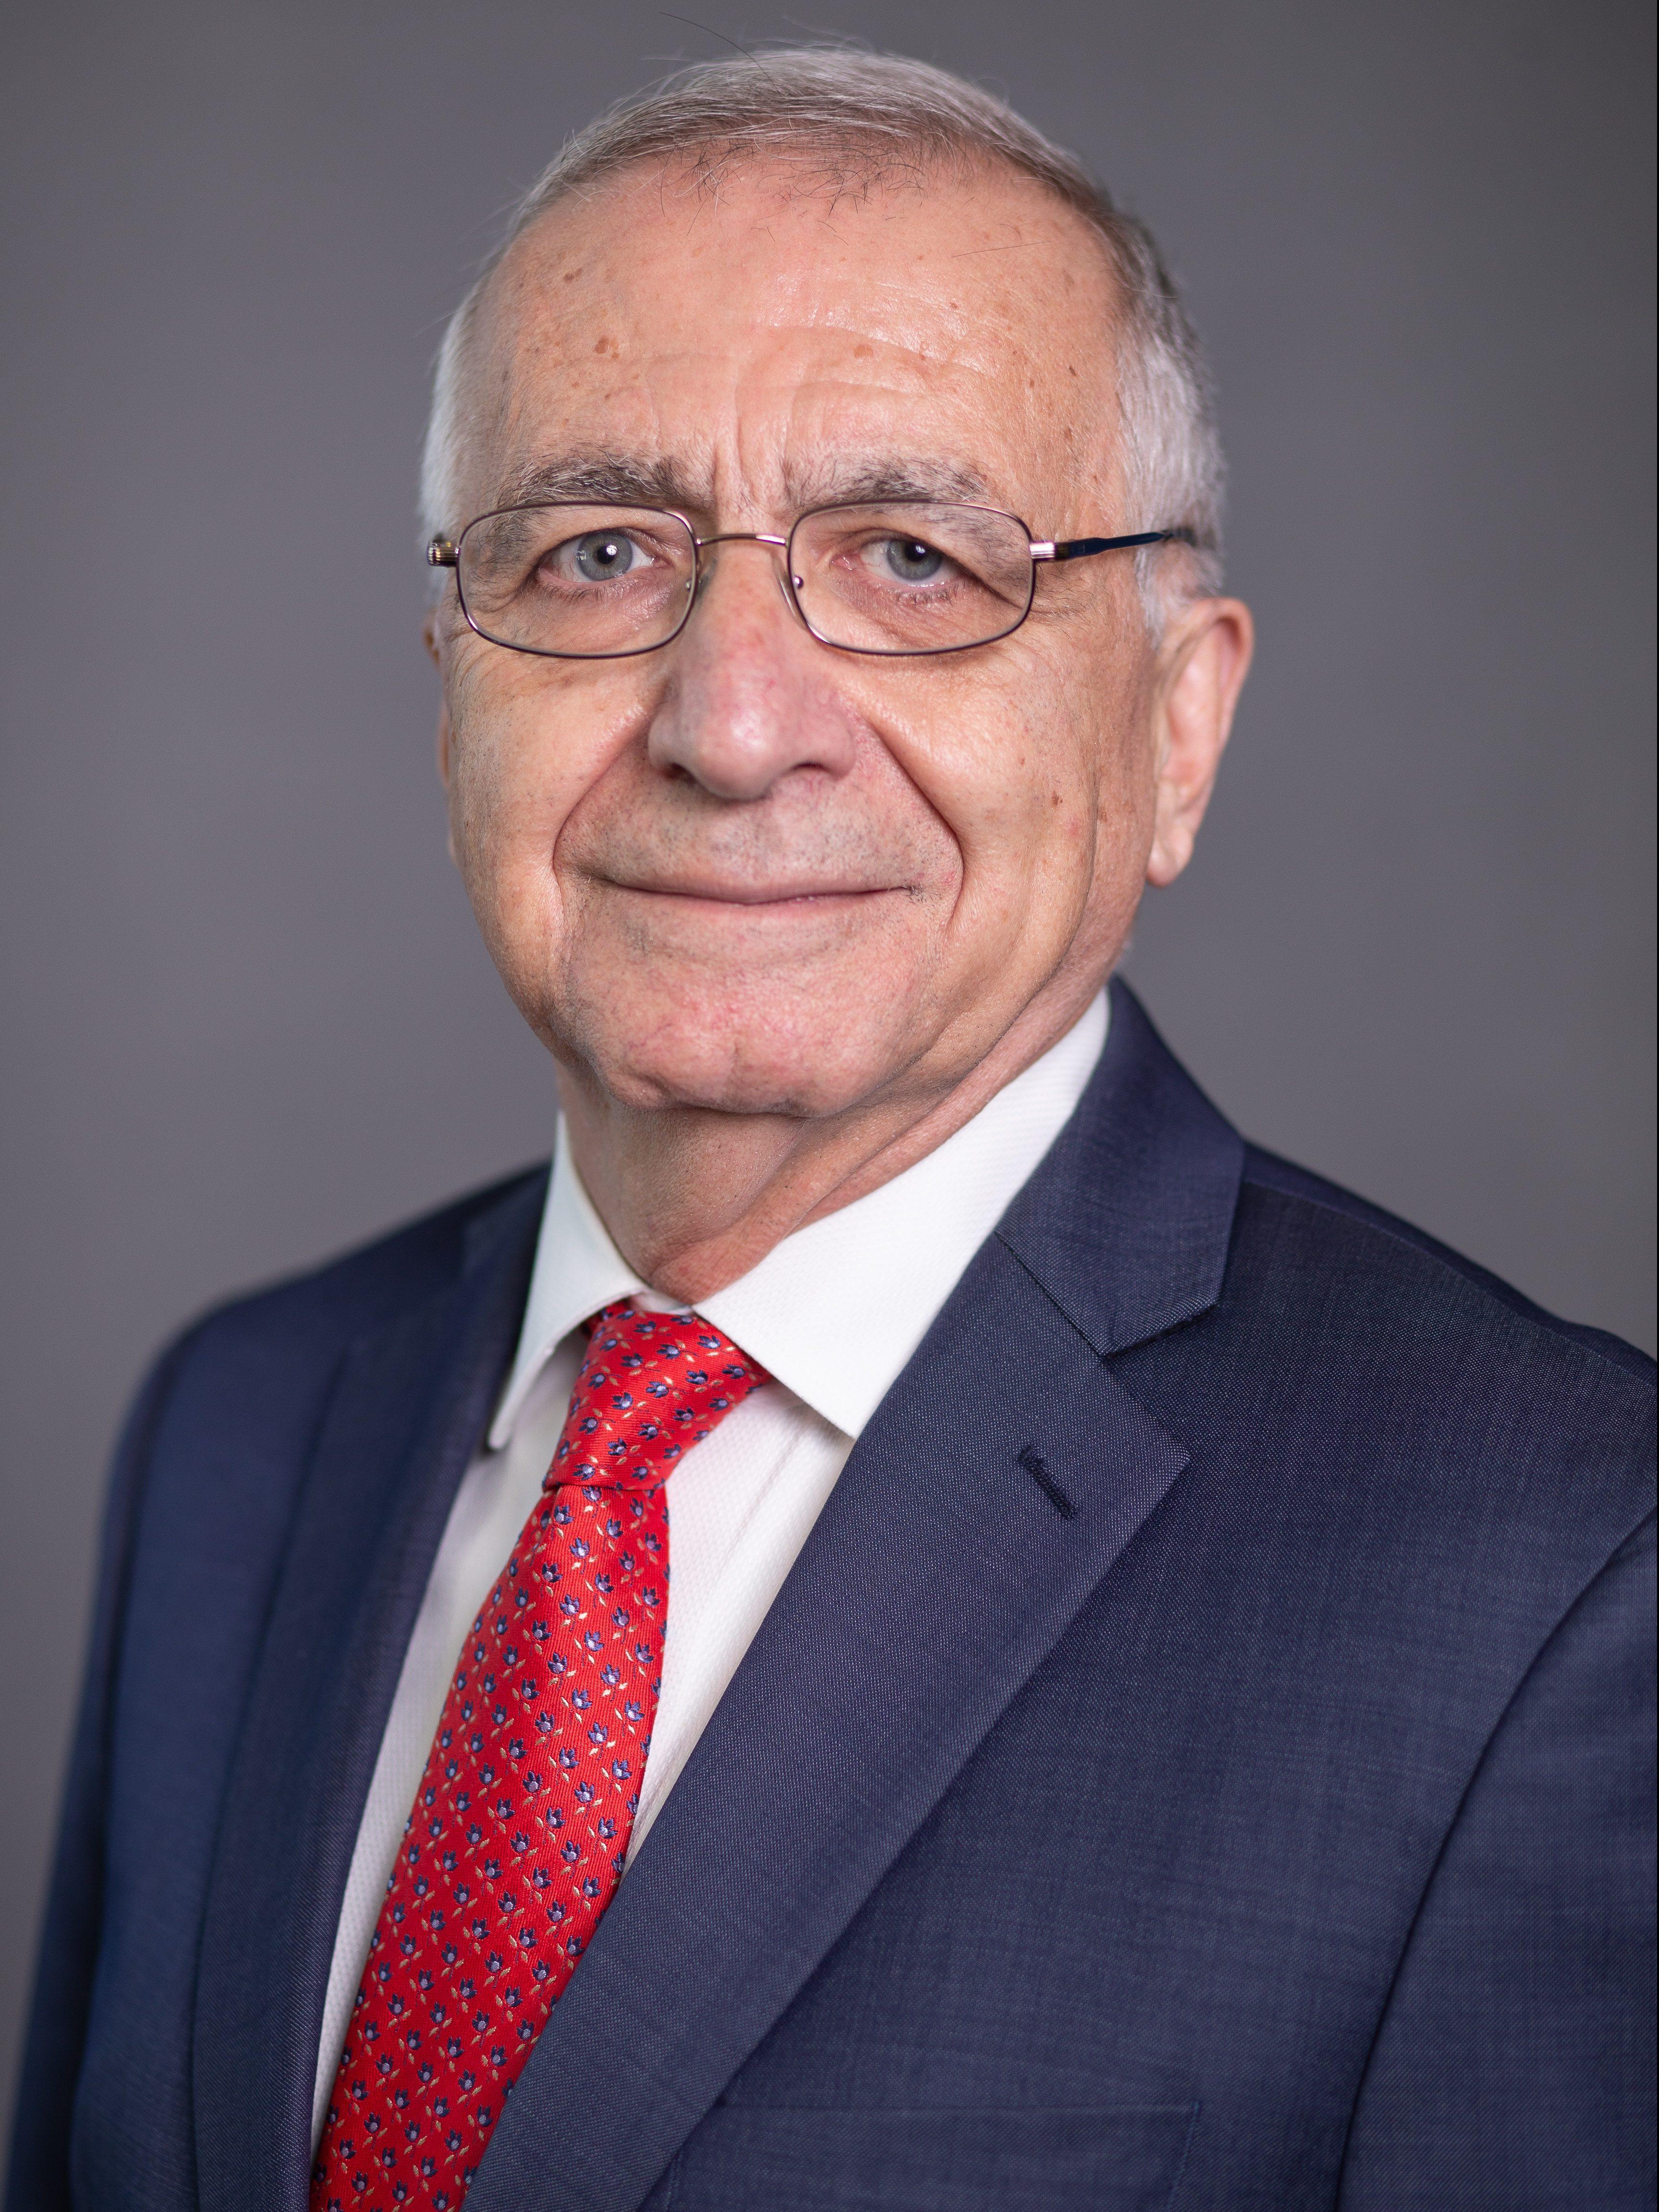 Nader Uskowi headshot - 9.19